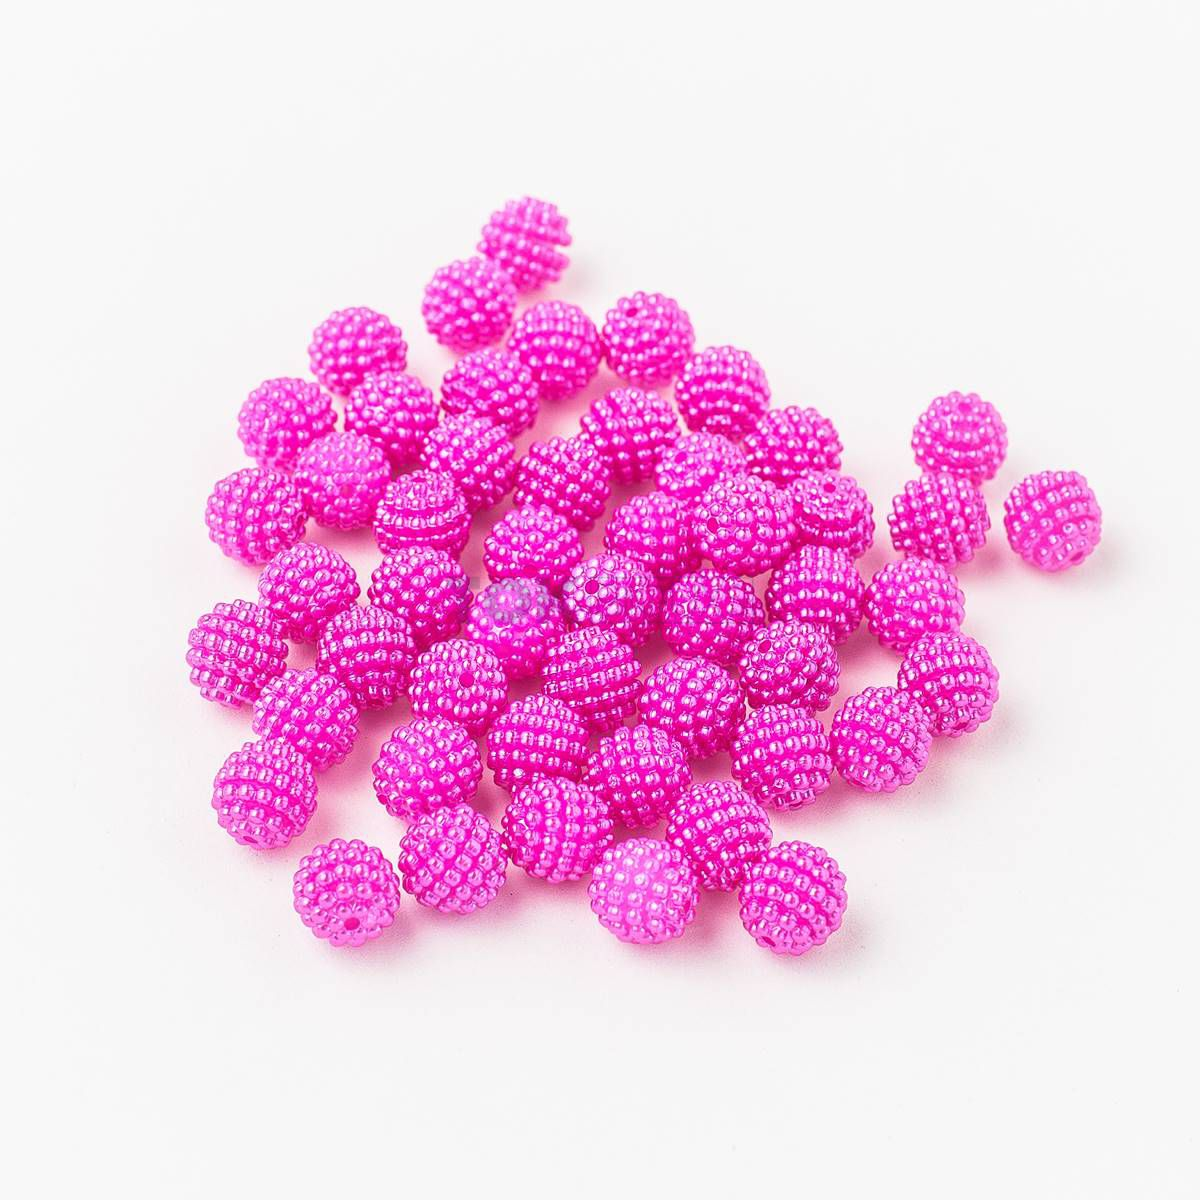 Pérola Amora / Craquelada Abs 10mm - Pink - 25g